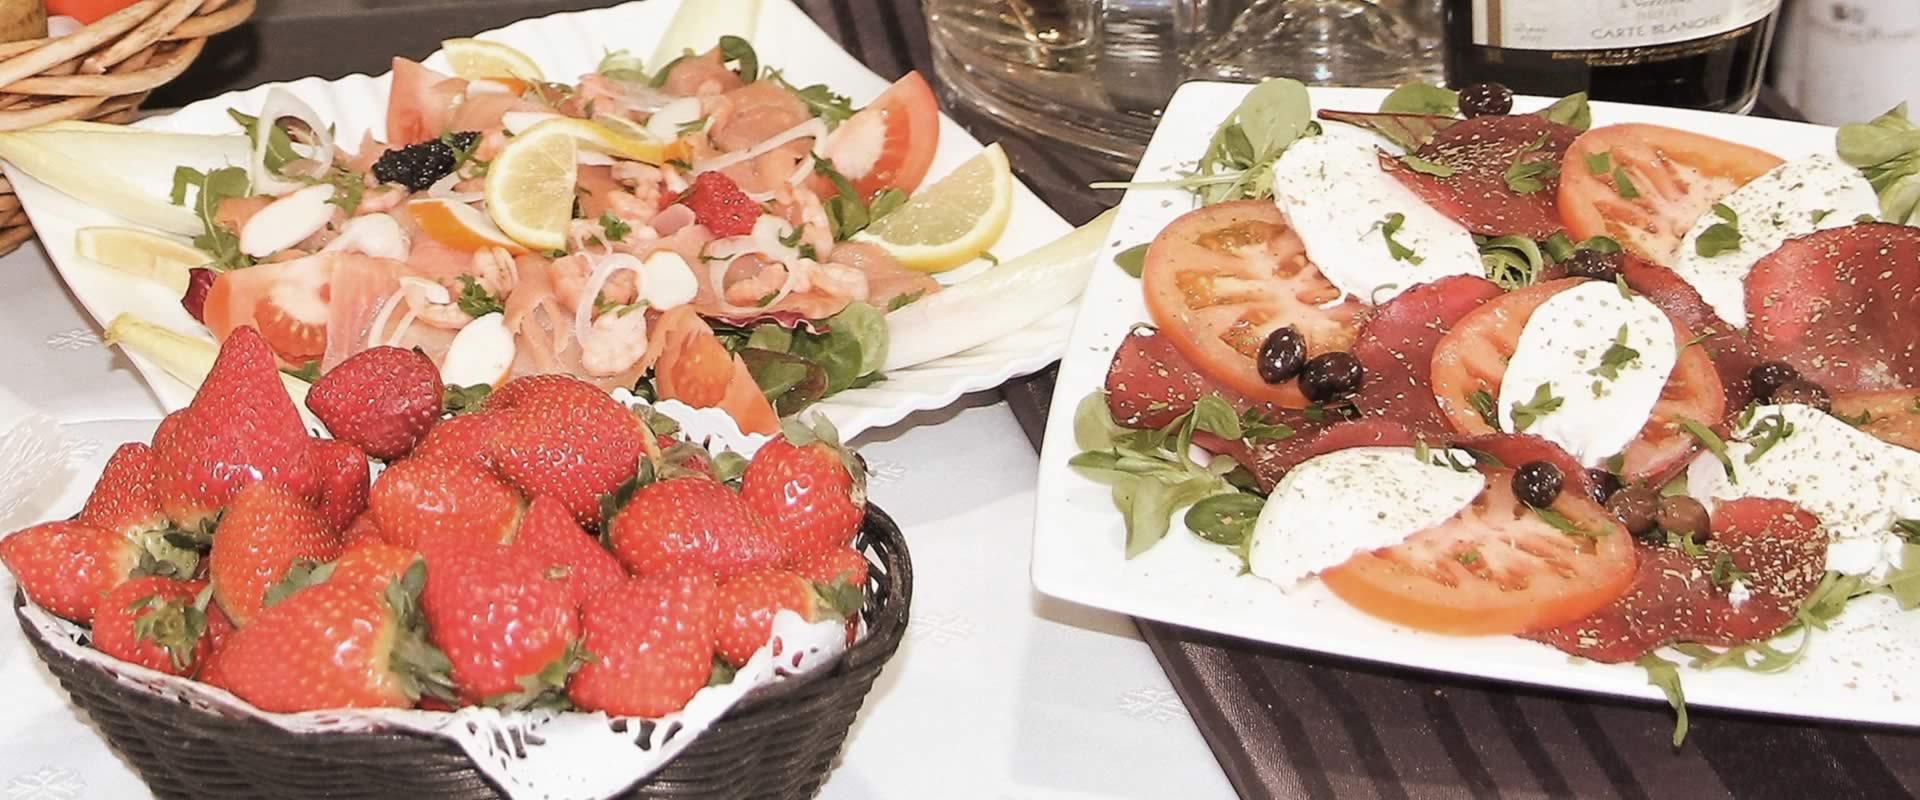 Les Selves restaurant cuisine traditionnelle